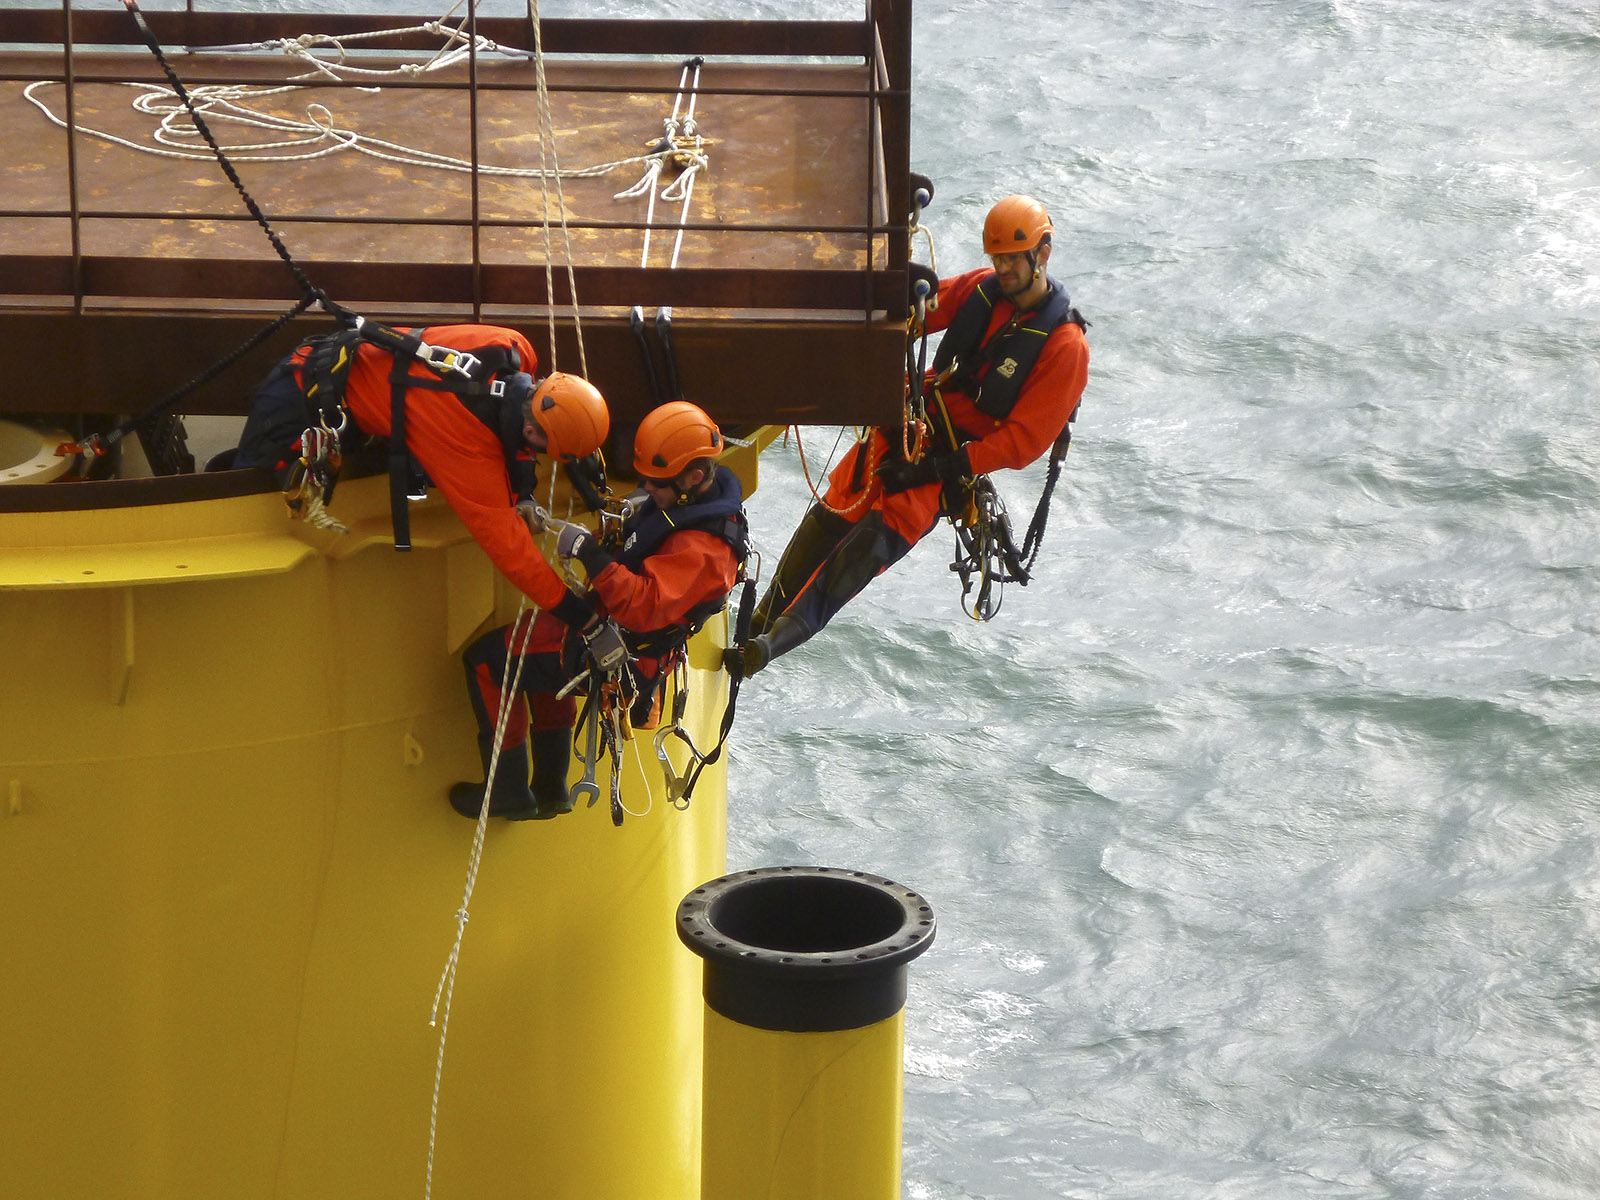 Rigging, offshore